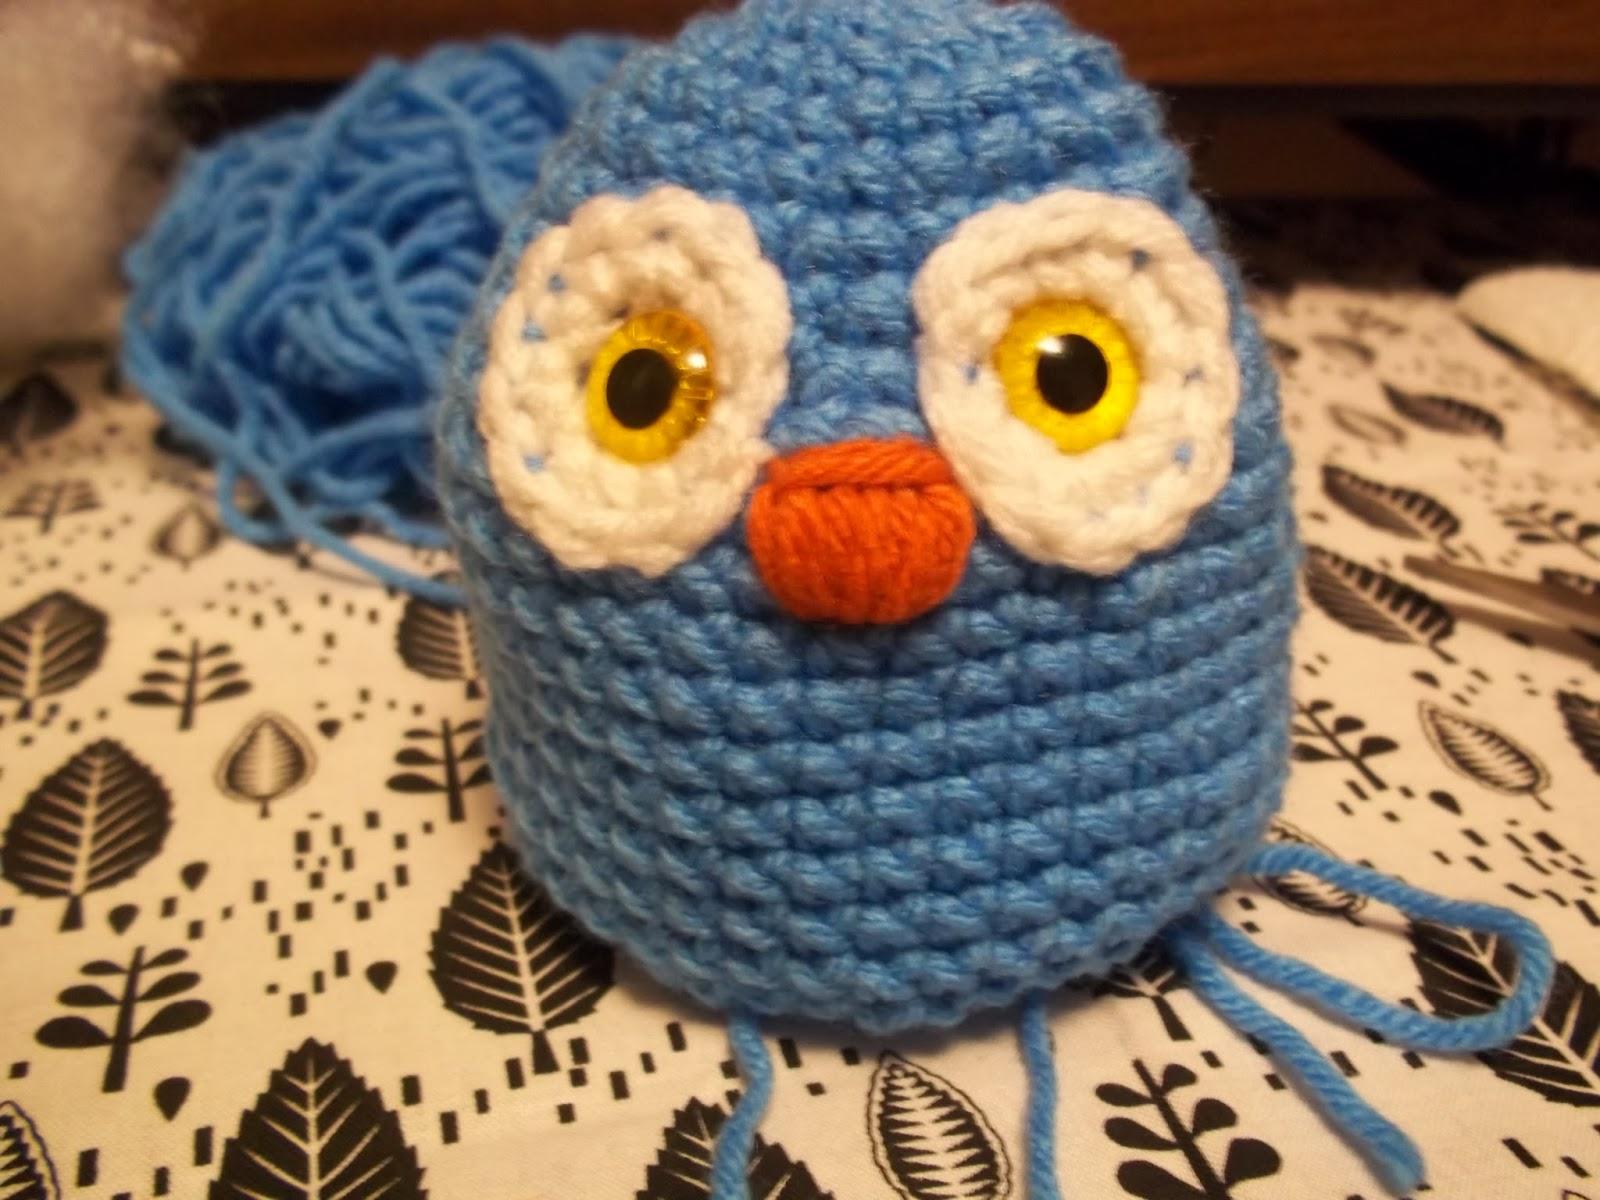 Amigurumi Owl Beak : Eden is only a dream away: Crochet Owl Amigurumi Pattern